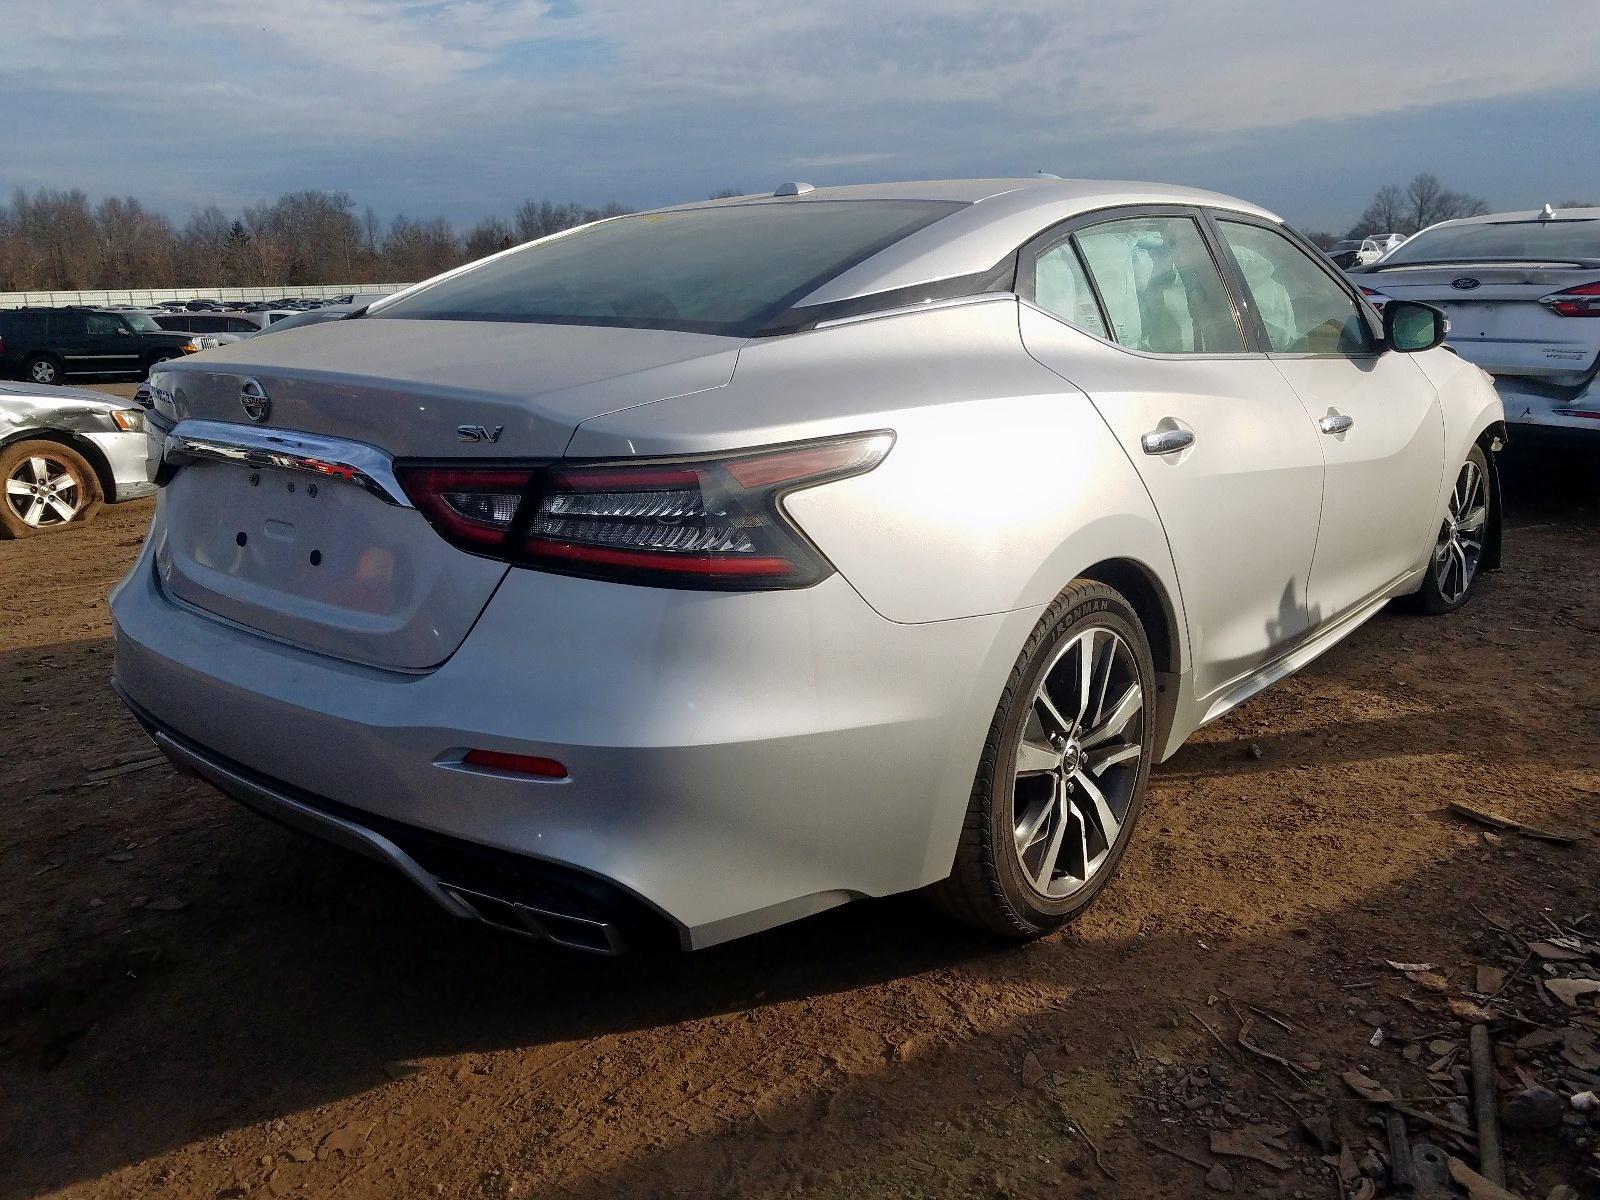 2019 Nissan Maxima S 3.5L 6 in Rental Vehicle Sale ...